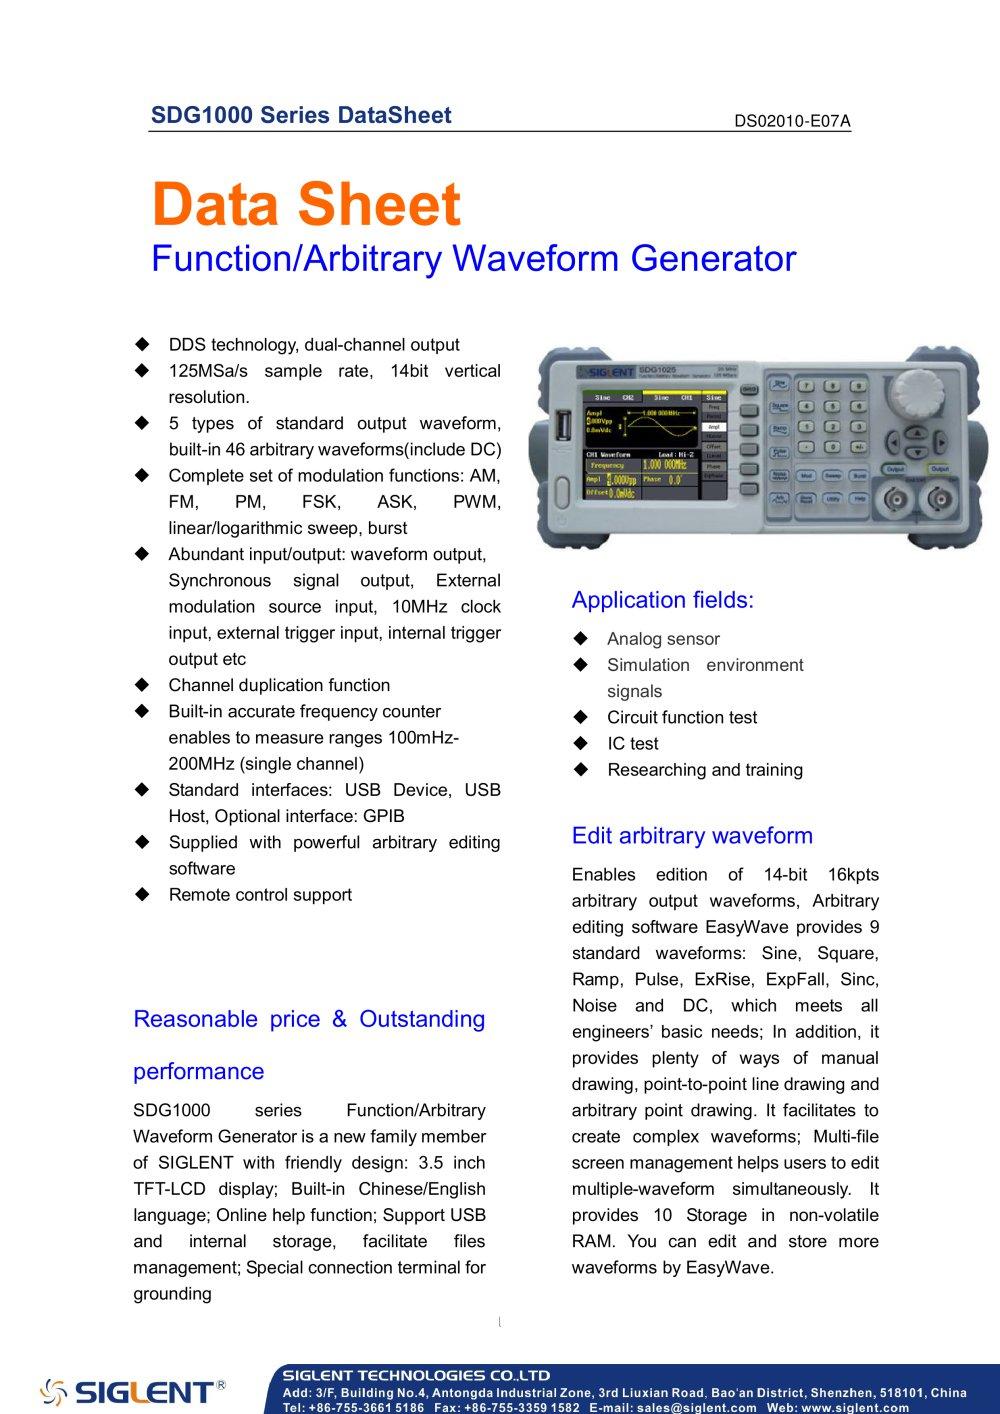 Siglent Sdg1000 Series Datasheet Function Arbitrary Waveform Working Of Generator Circuit 1 10 Pages